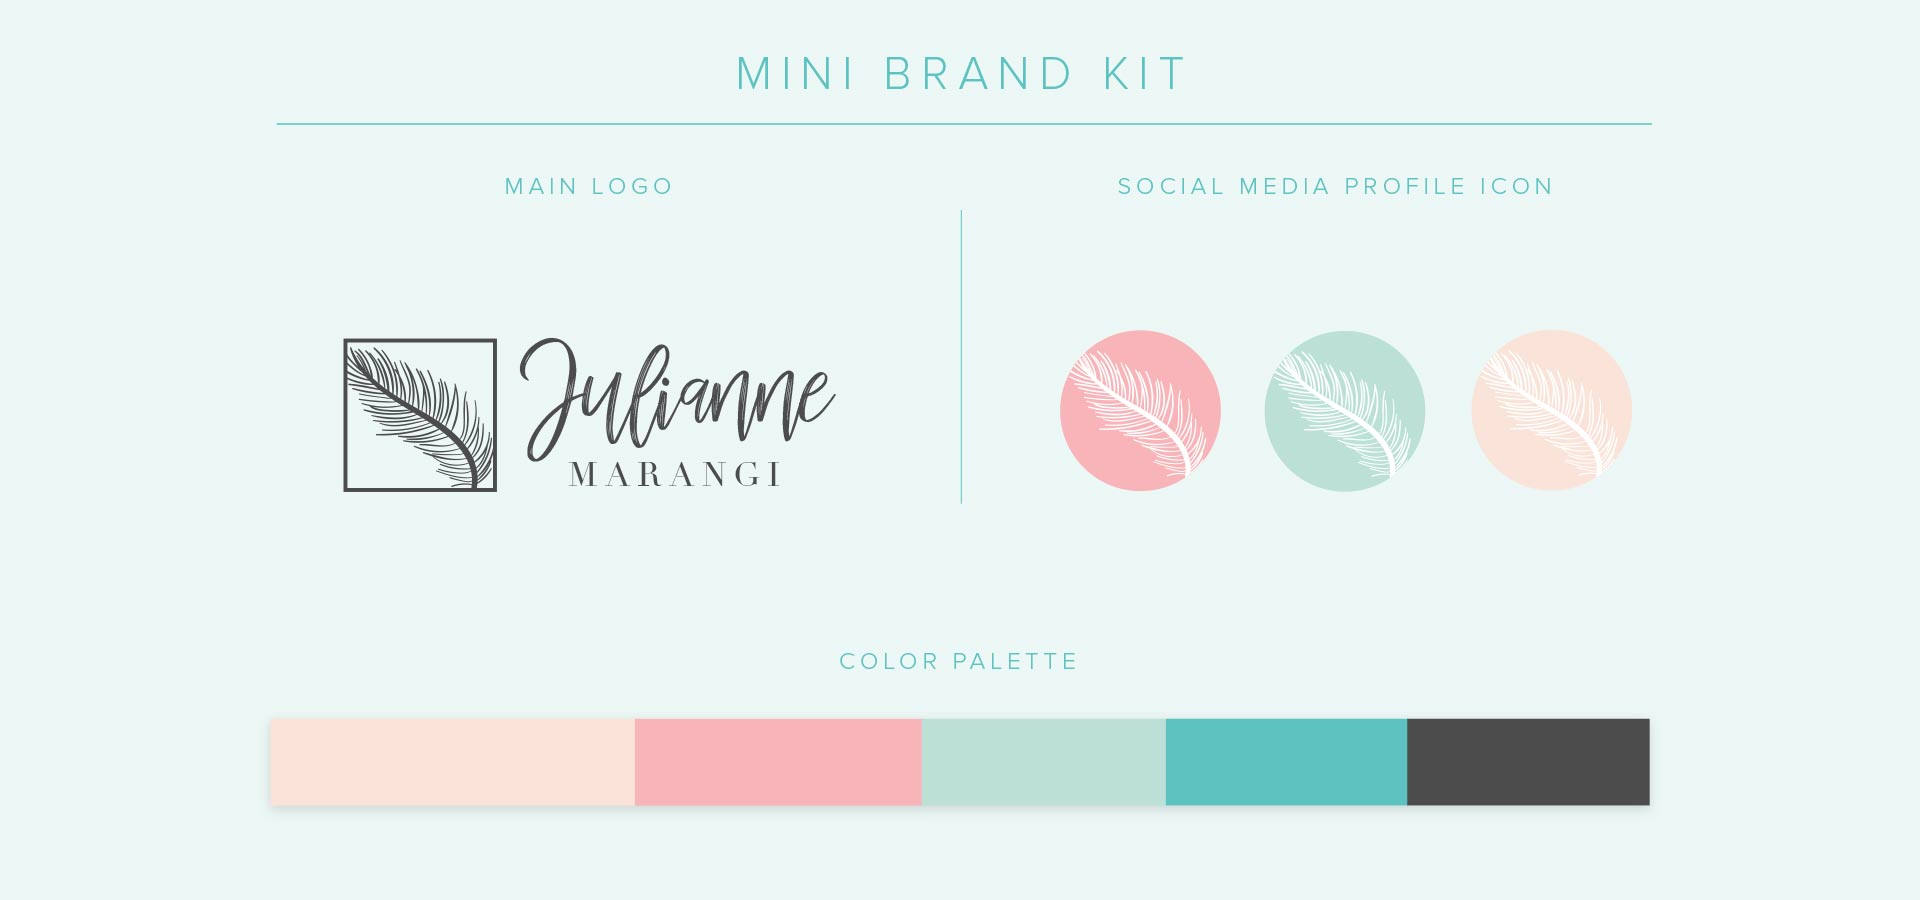 social media fashion brand kit